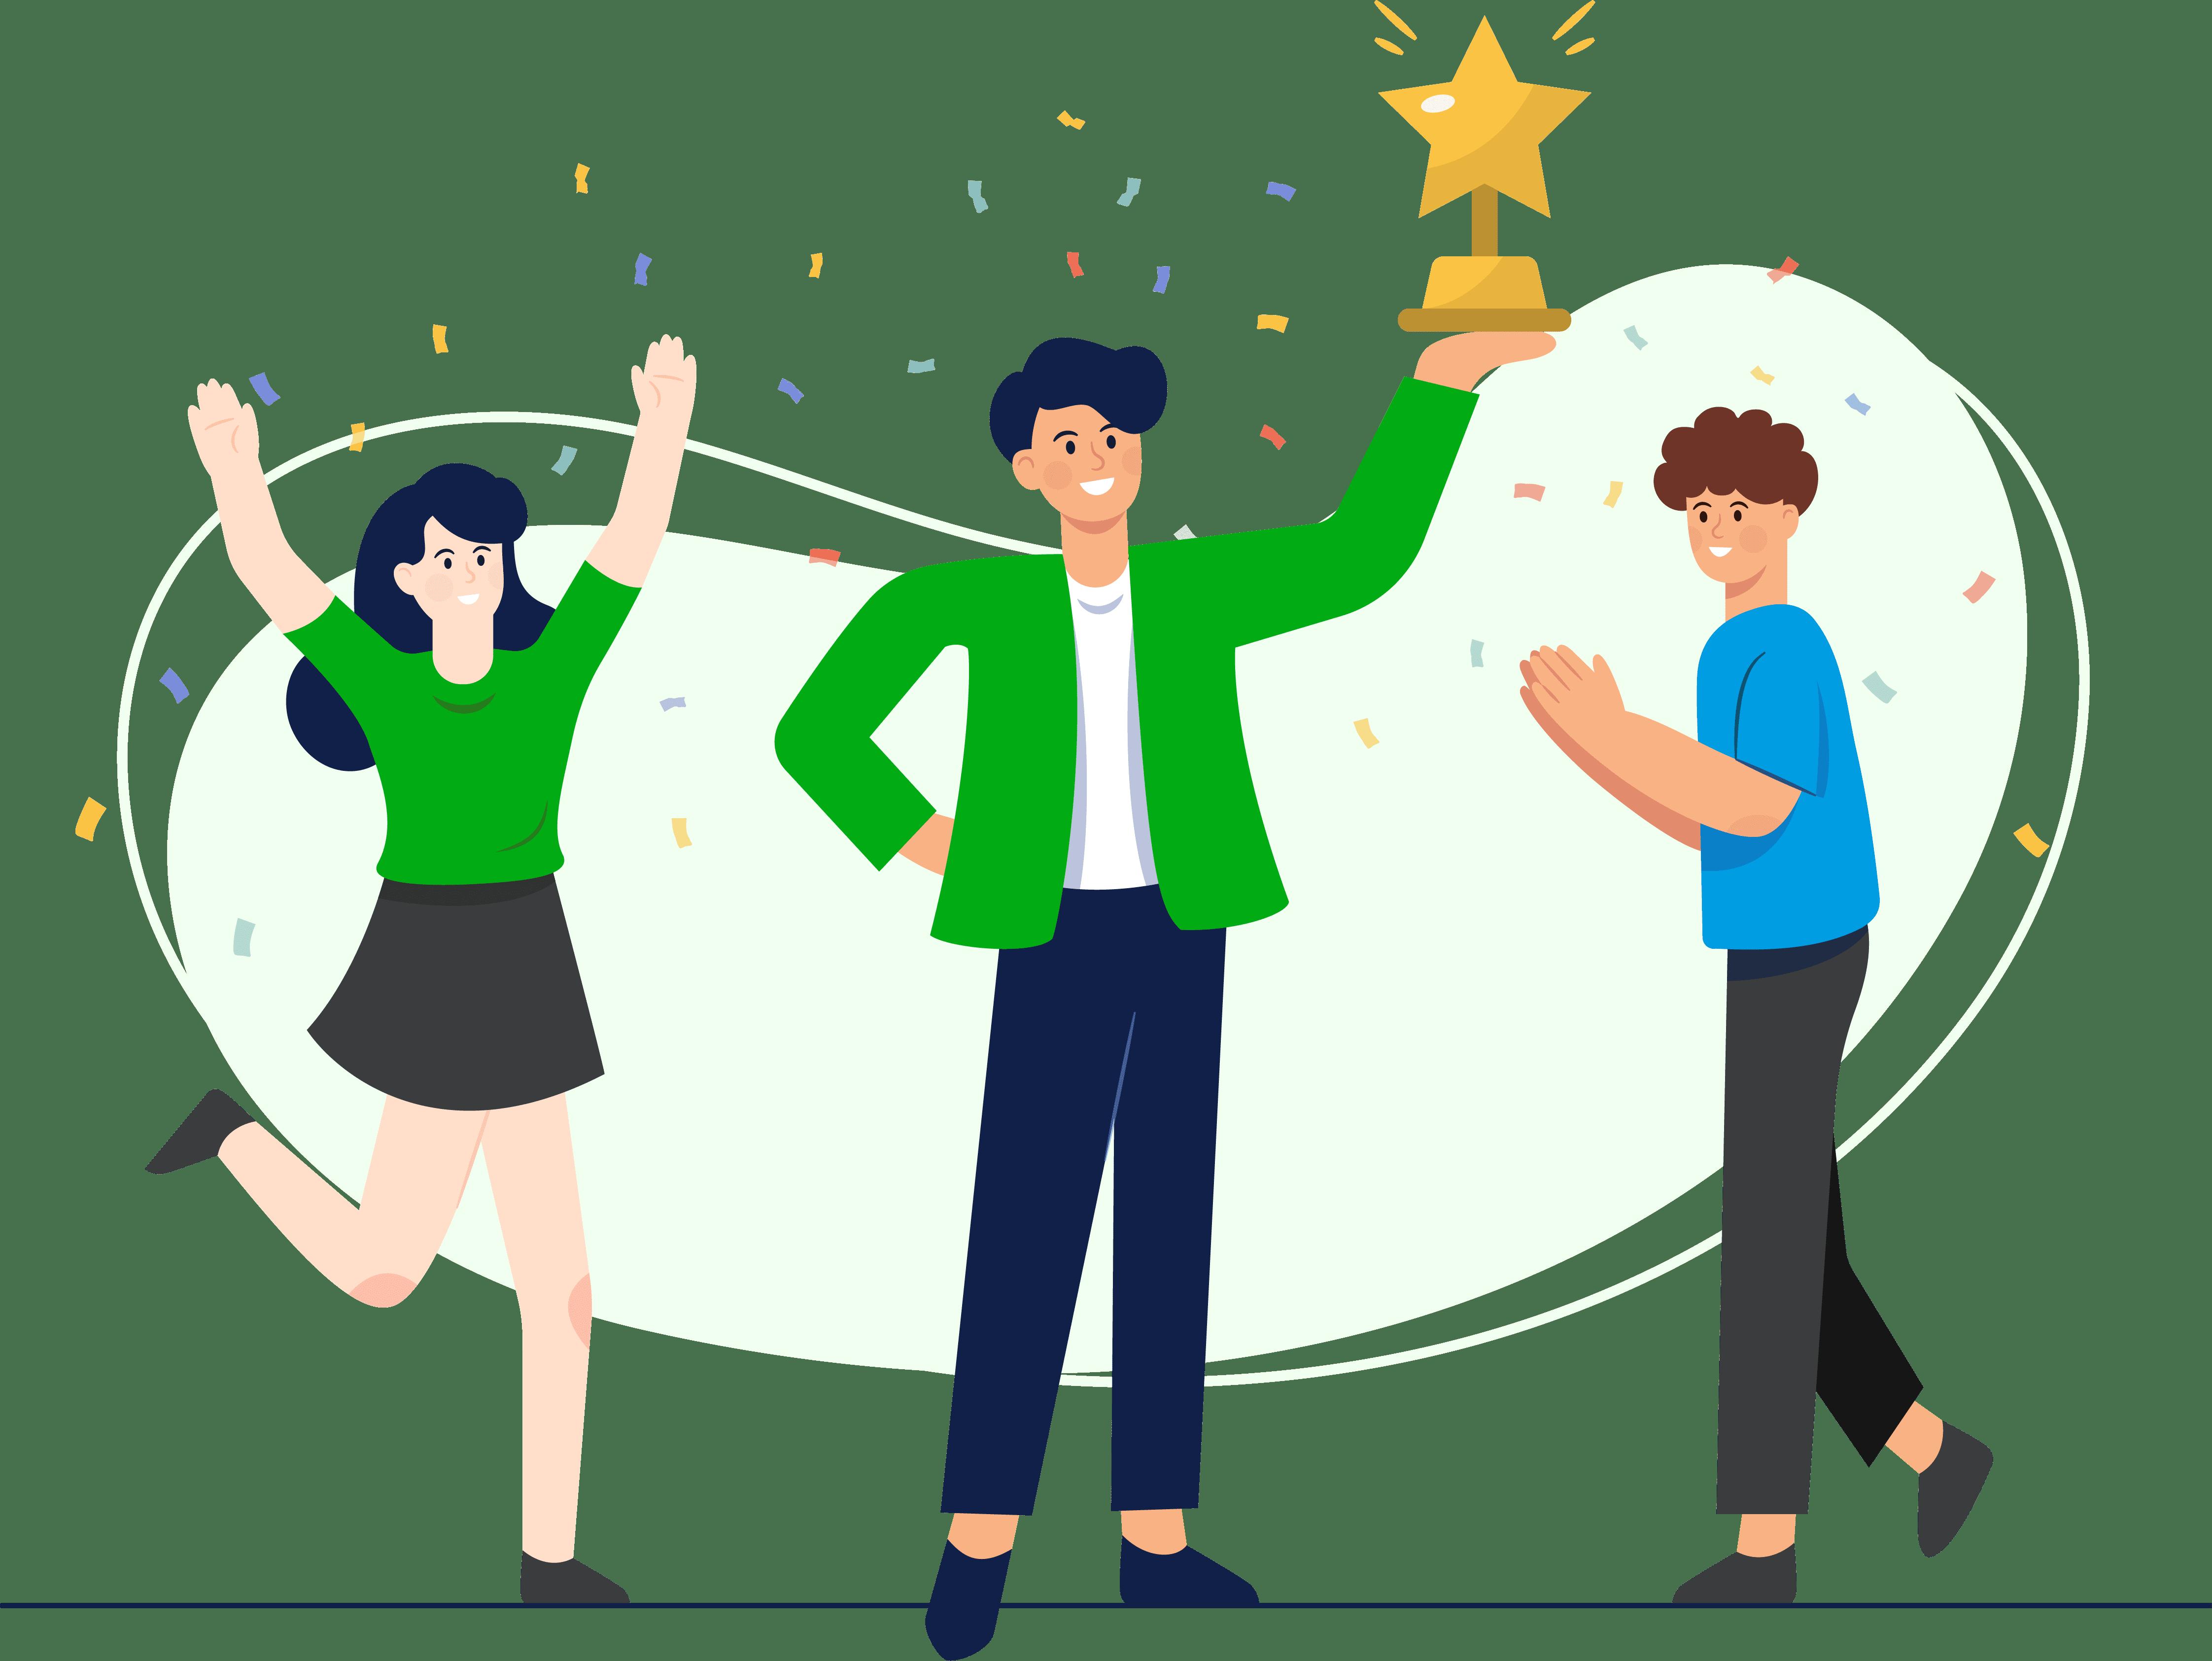 Winning an award illustration